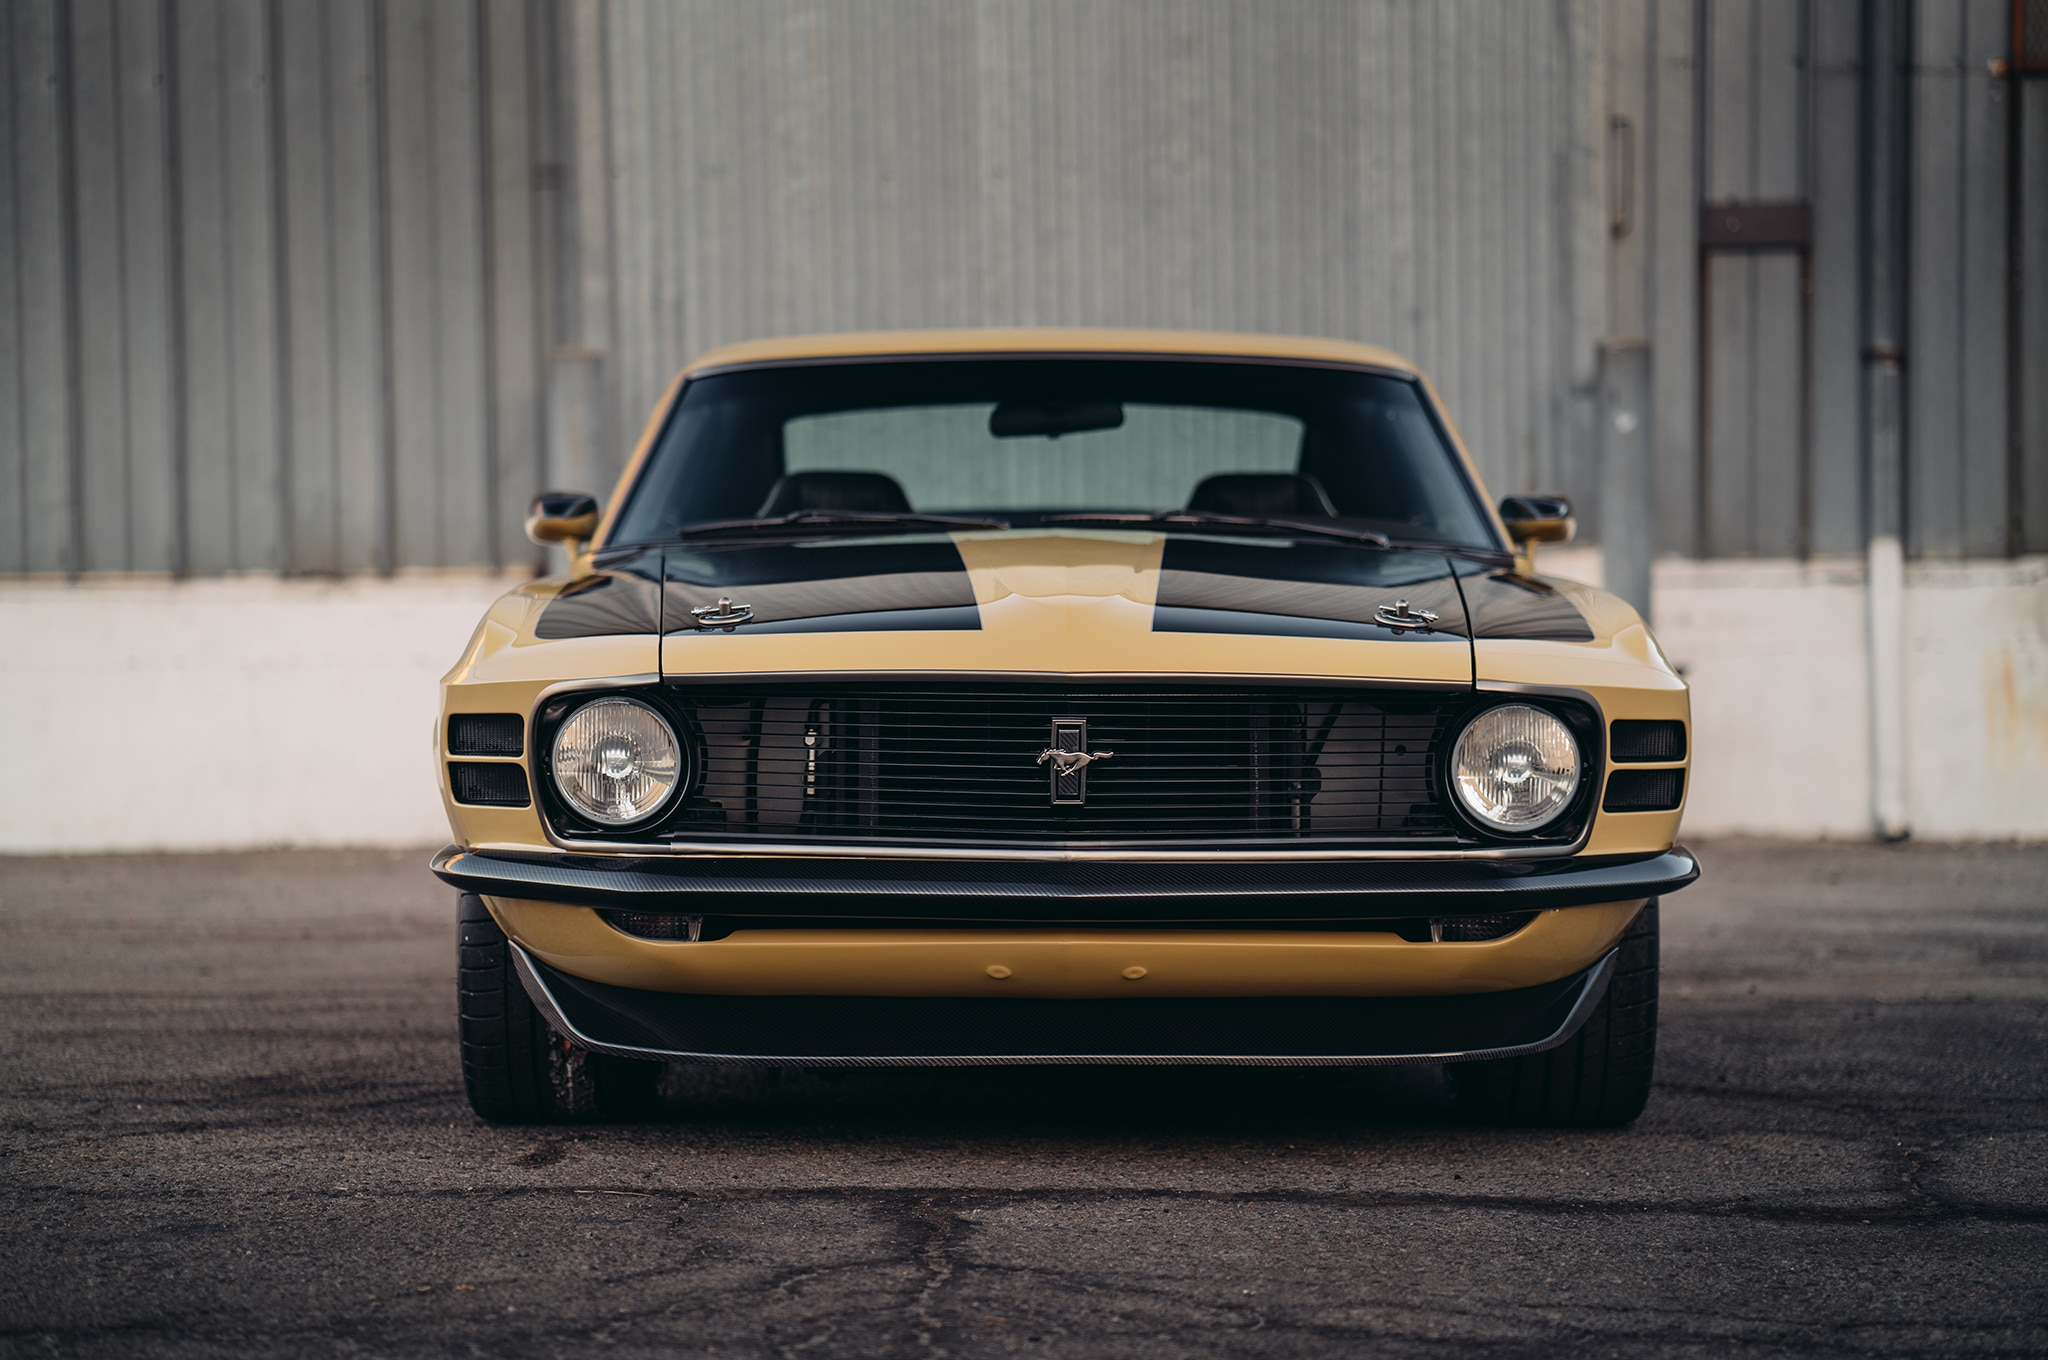 Speedkore Customizes A 1970 Ford Mustang Boss For Robert Downey Jr Gt Convertible Show More